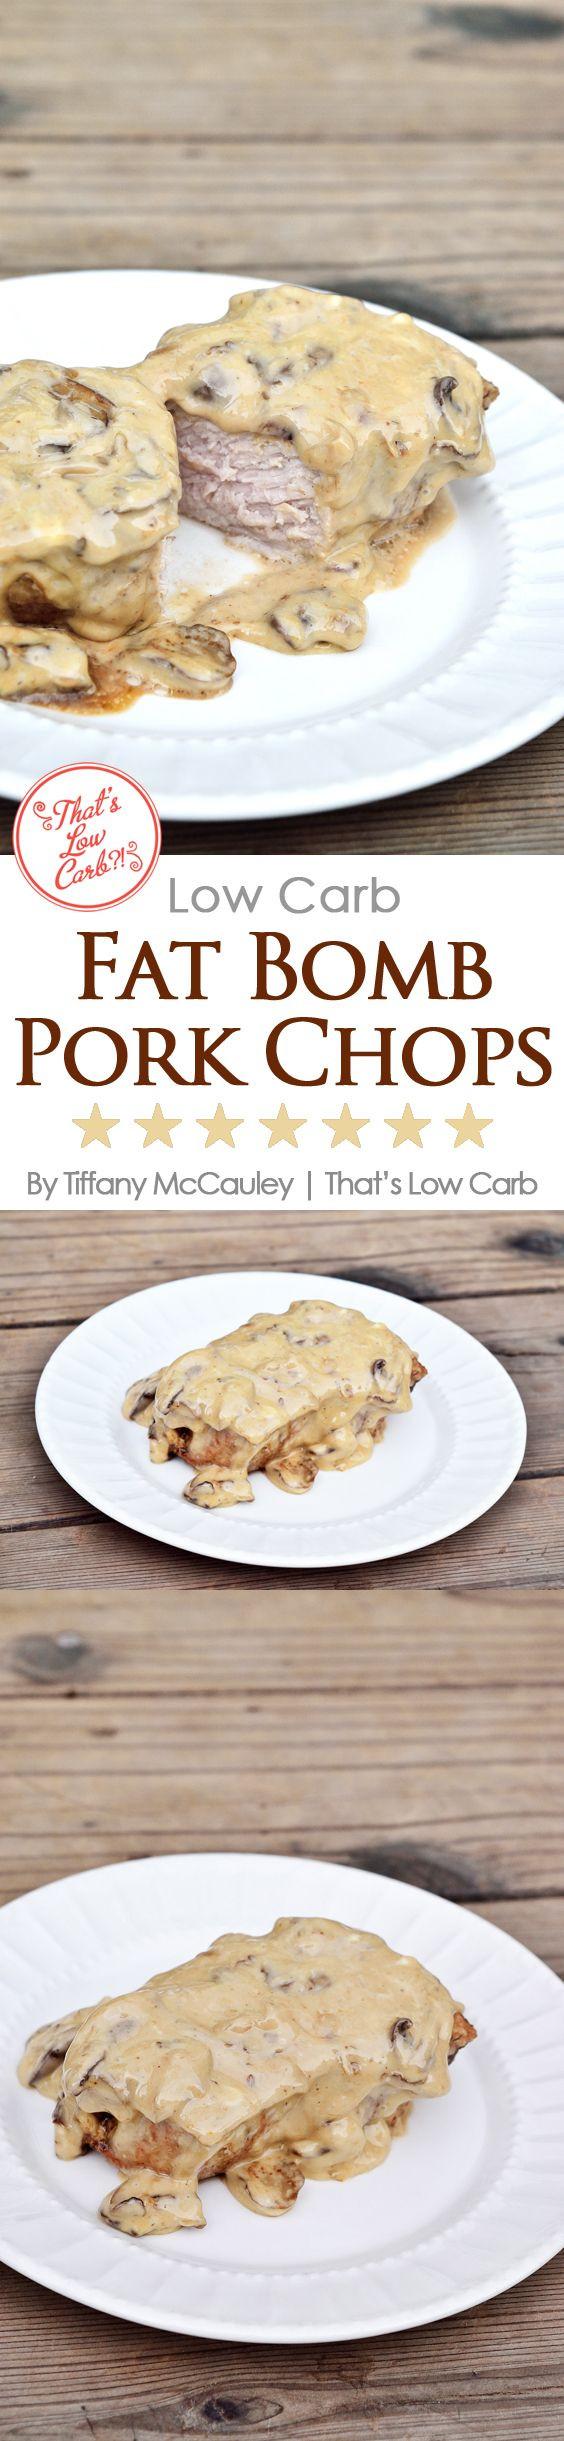 Low Calorie Pork Chop Recipes  Low Carb Fat Bomb Pork Chops Recipe – KetosisDiet